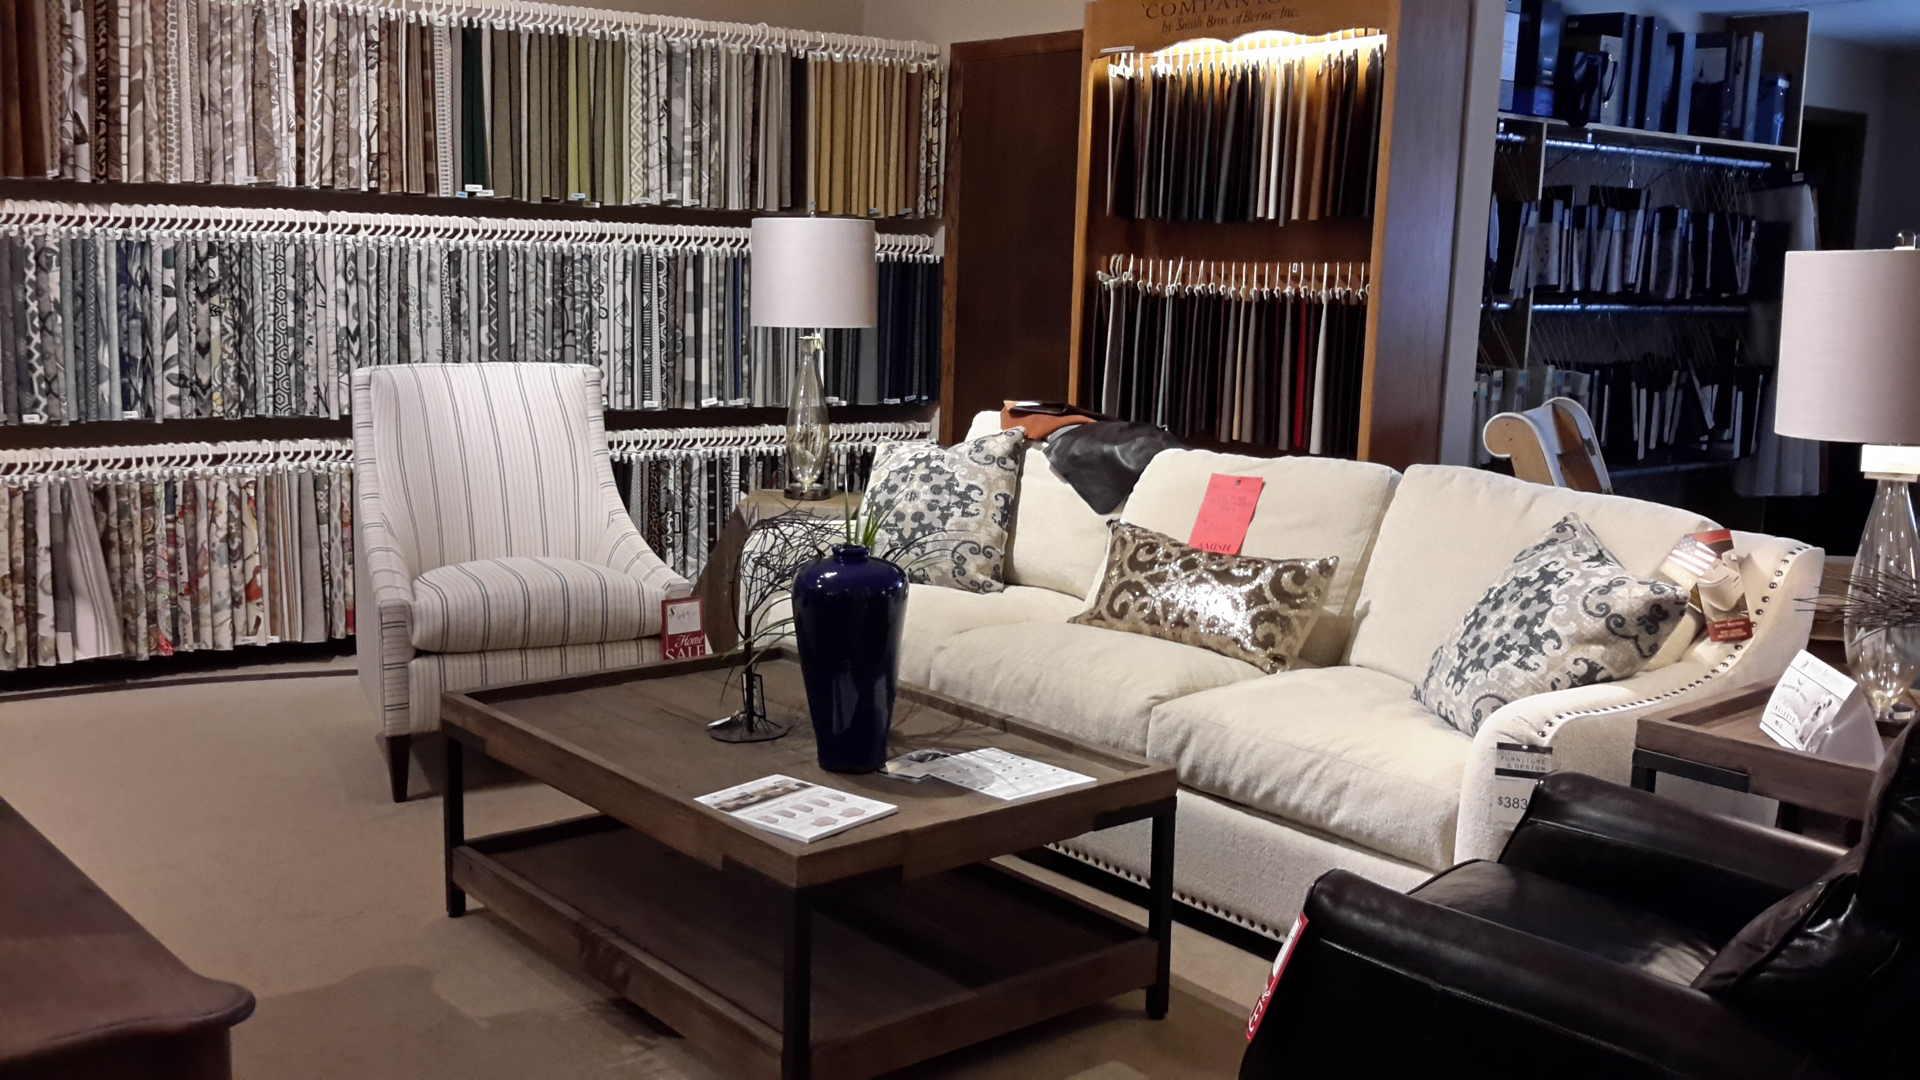 Furniture  West Bend, Wisconsin  West Bend Furniture